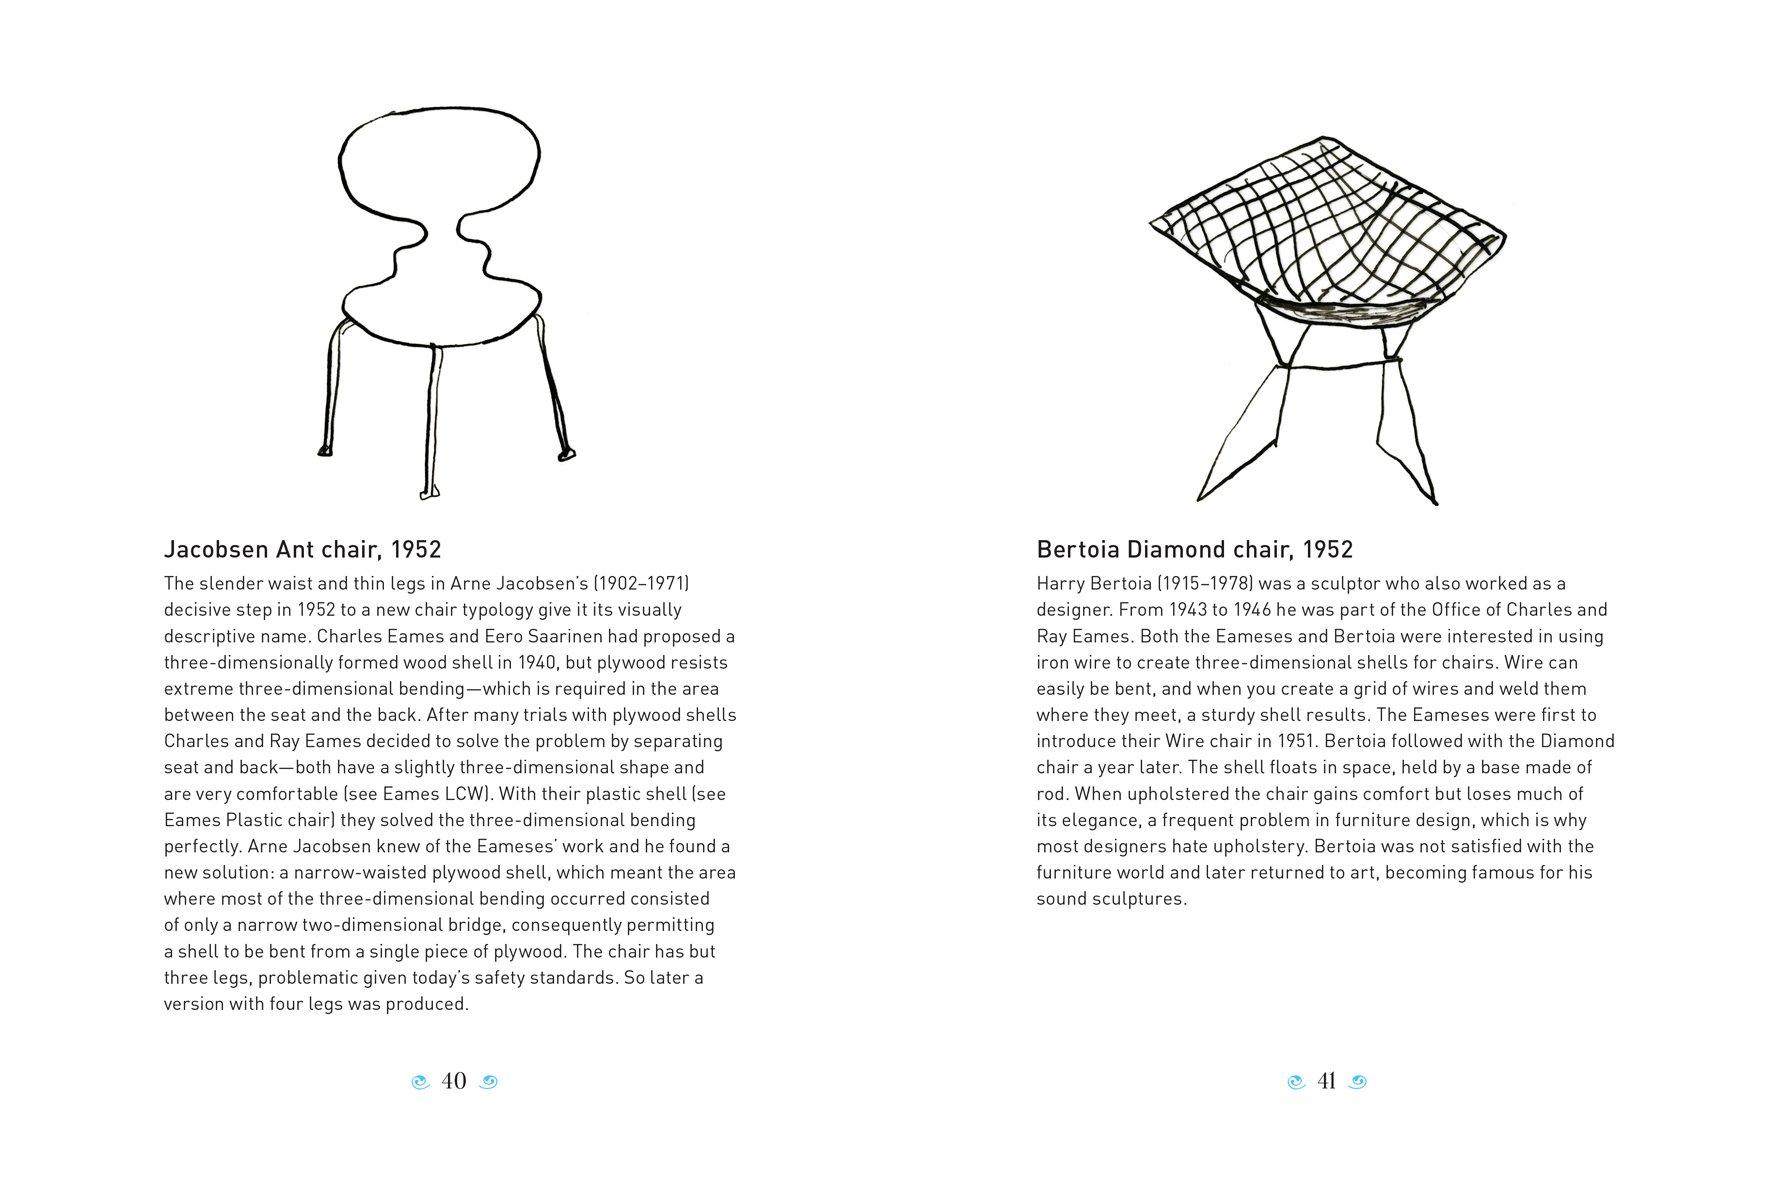 Bertoia diamond chair dimensions - The Lucky Plucky Chairs Rolf Fehlbaum Maira Kalman 9783945852095 Amazon Com Books